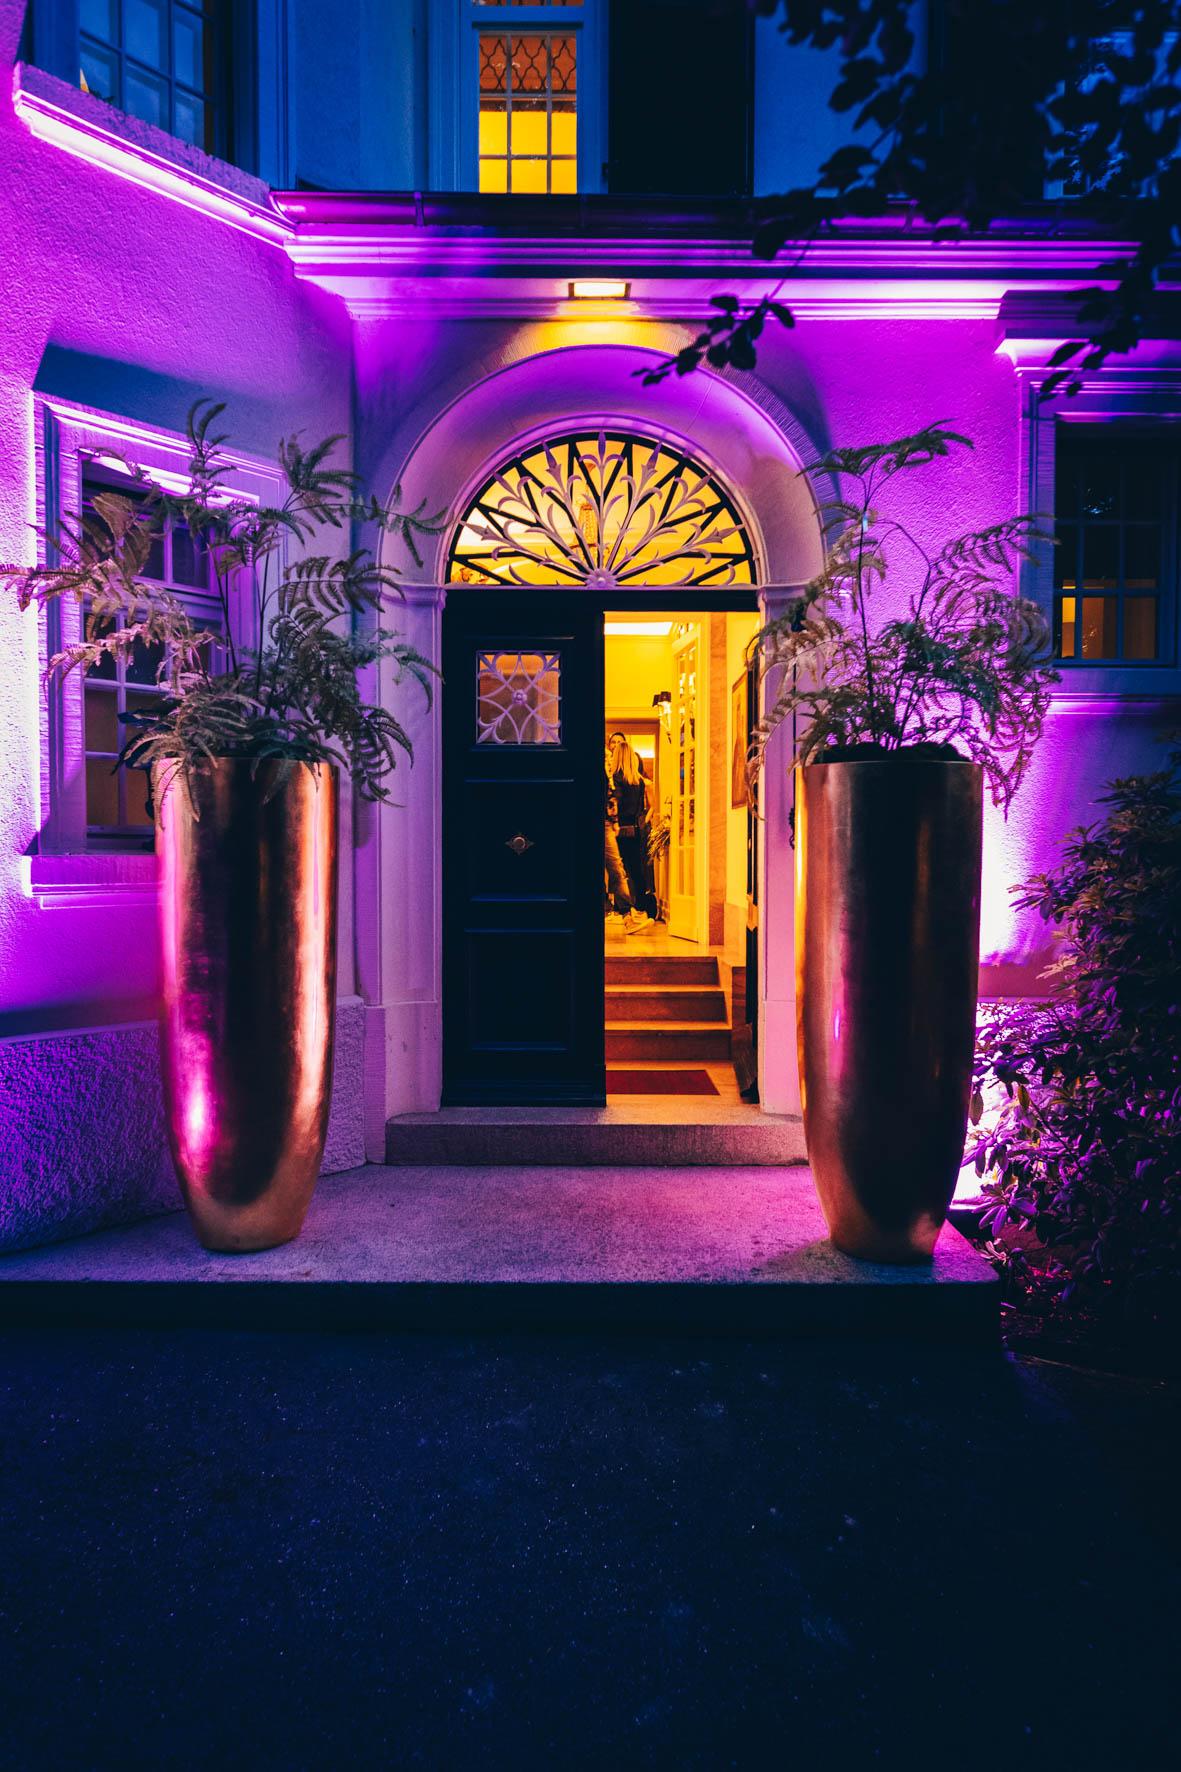 Konrad-lifestyle-art-basel-%22rollsroyce%22-2019-123.jpg